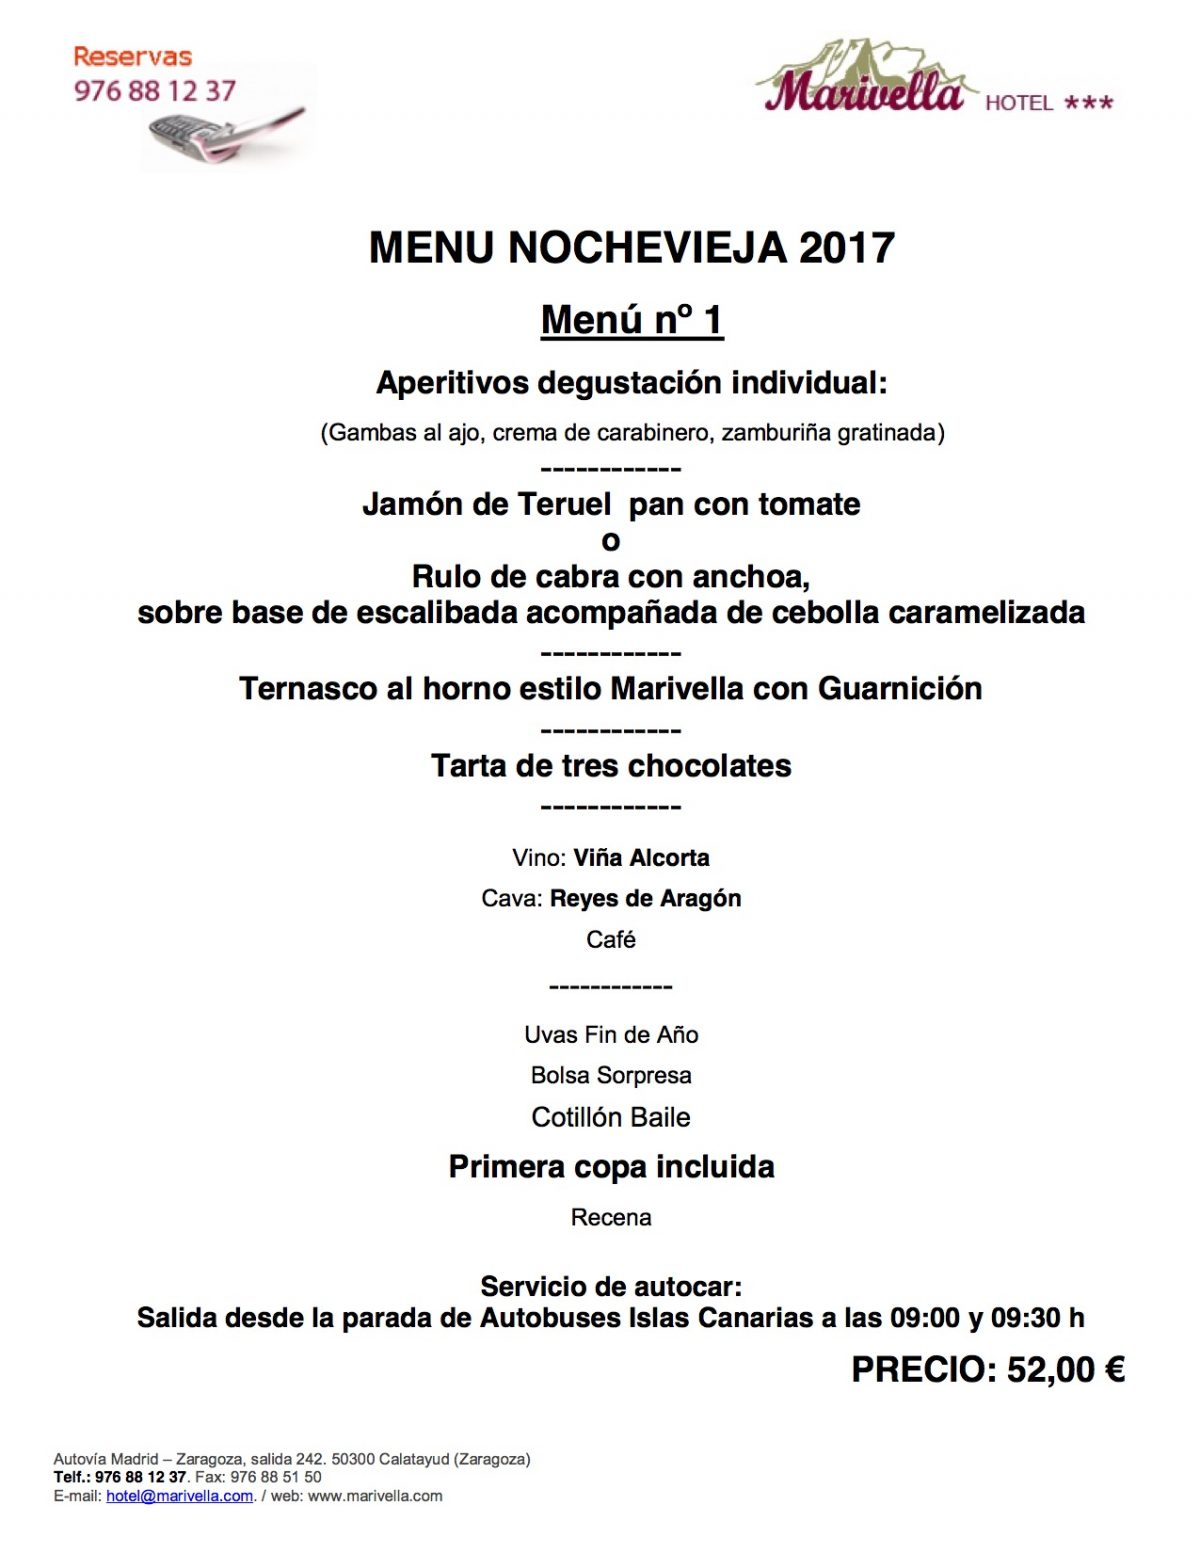 Nochevieja 2017 cena cotill n recena hotel - Menu cena de nochevieja ...